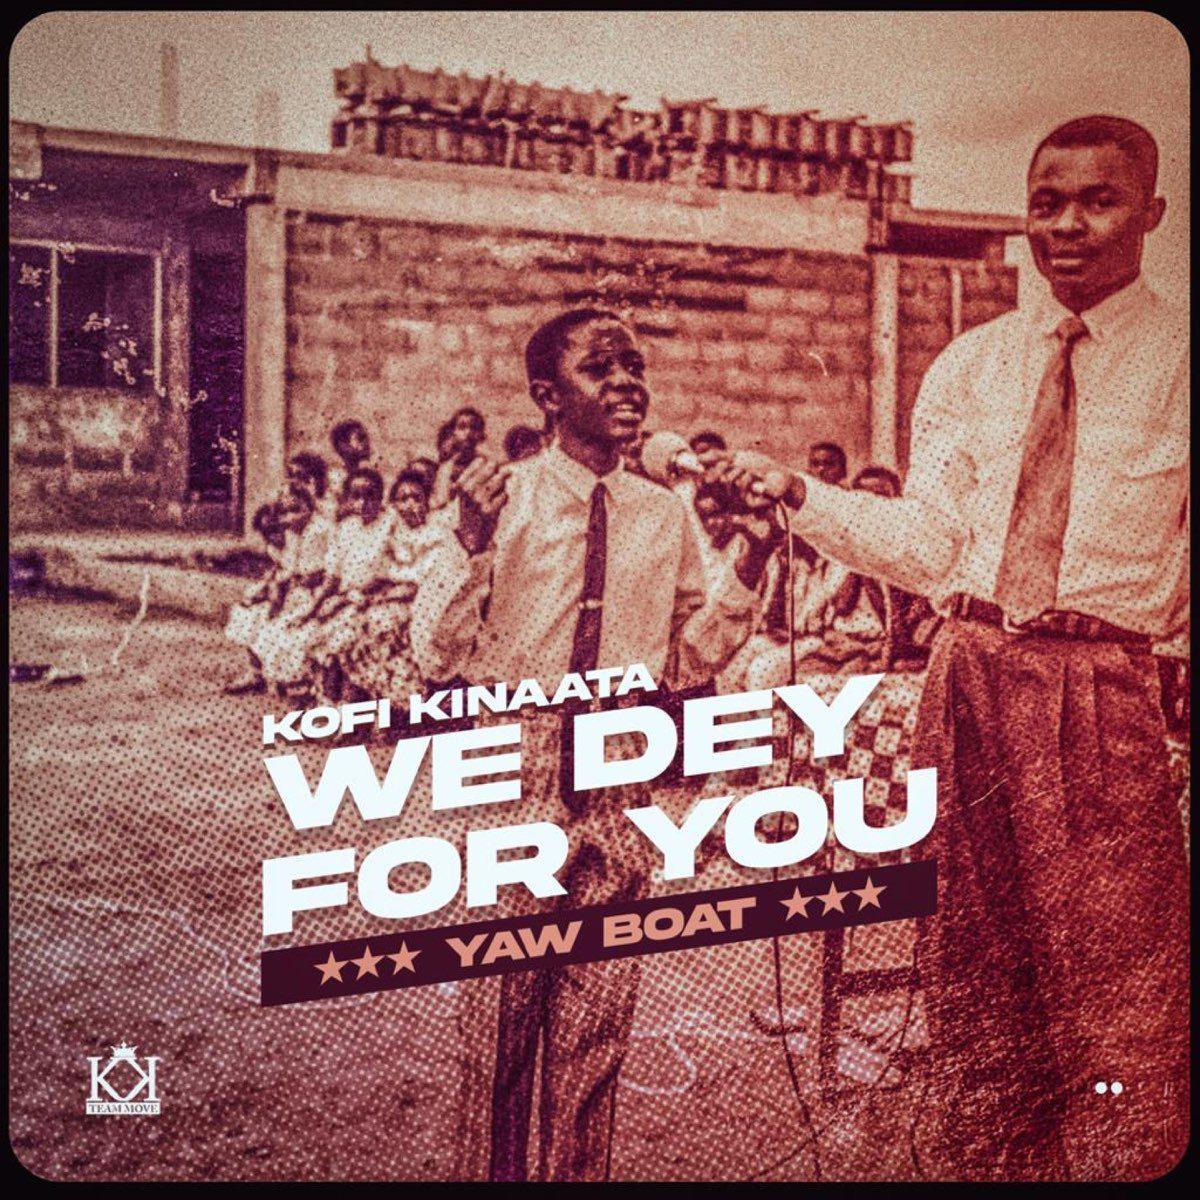 Kofi Kinaata - We Dey For You (Prod. By Two Bars)